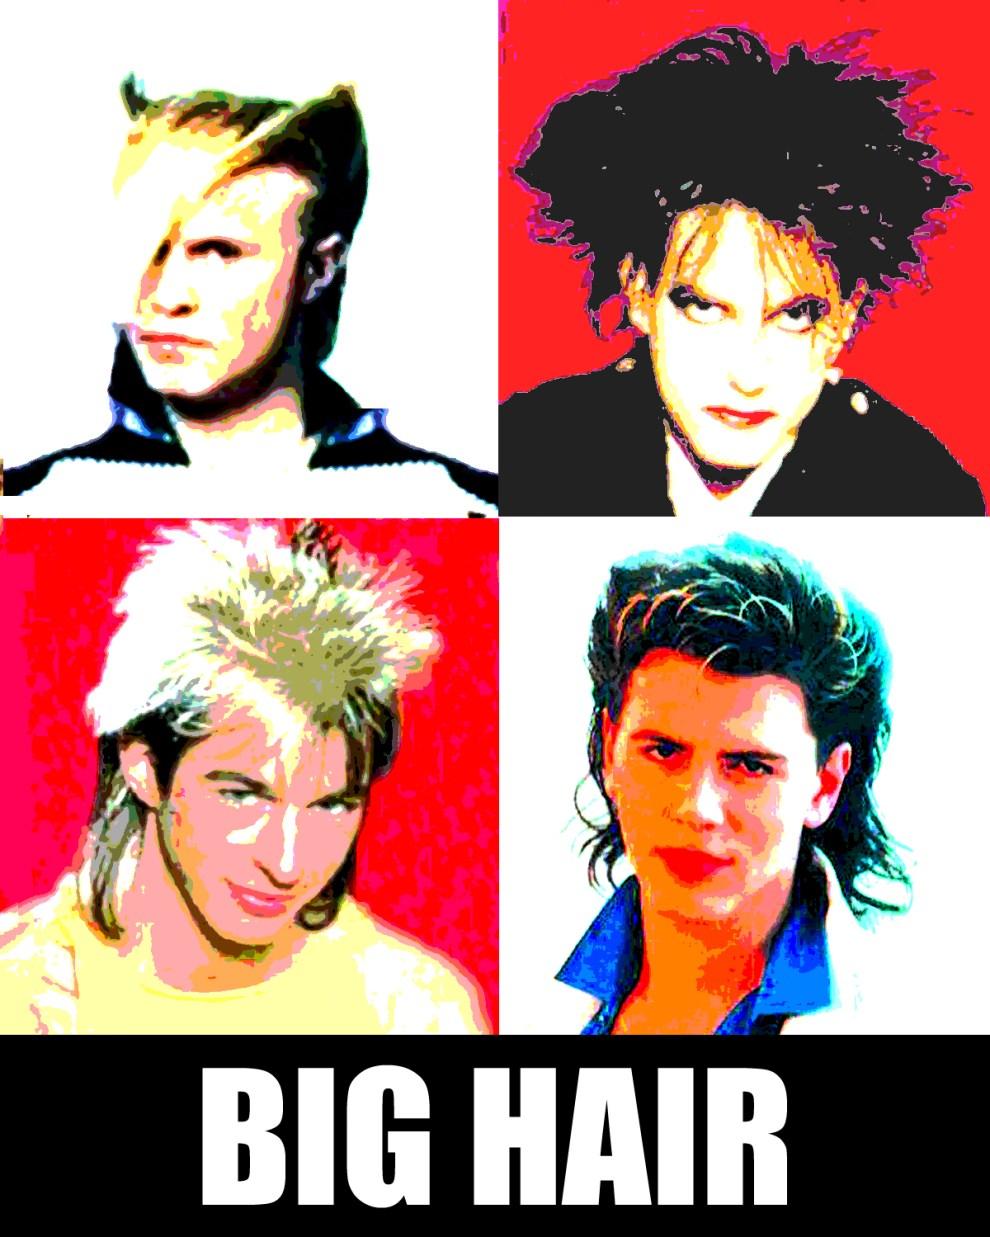 Big Hair, 2003